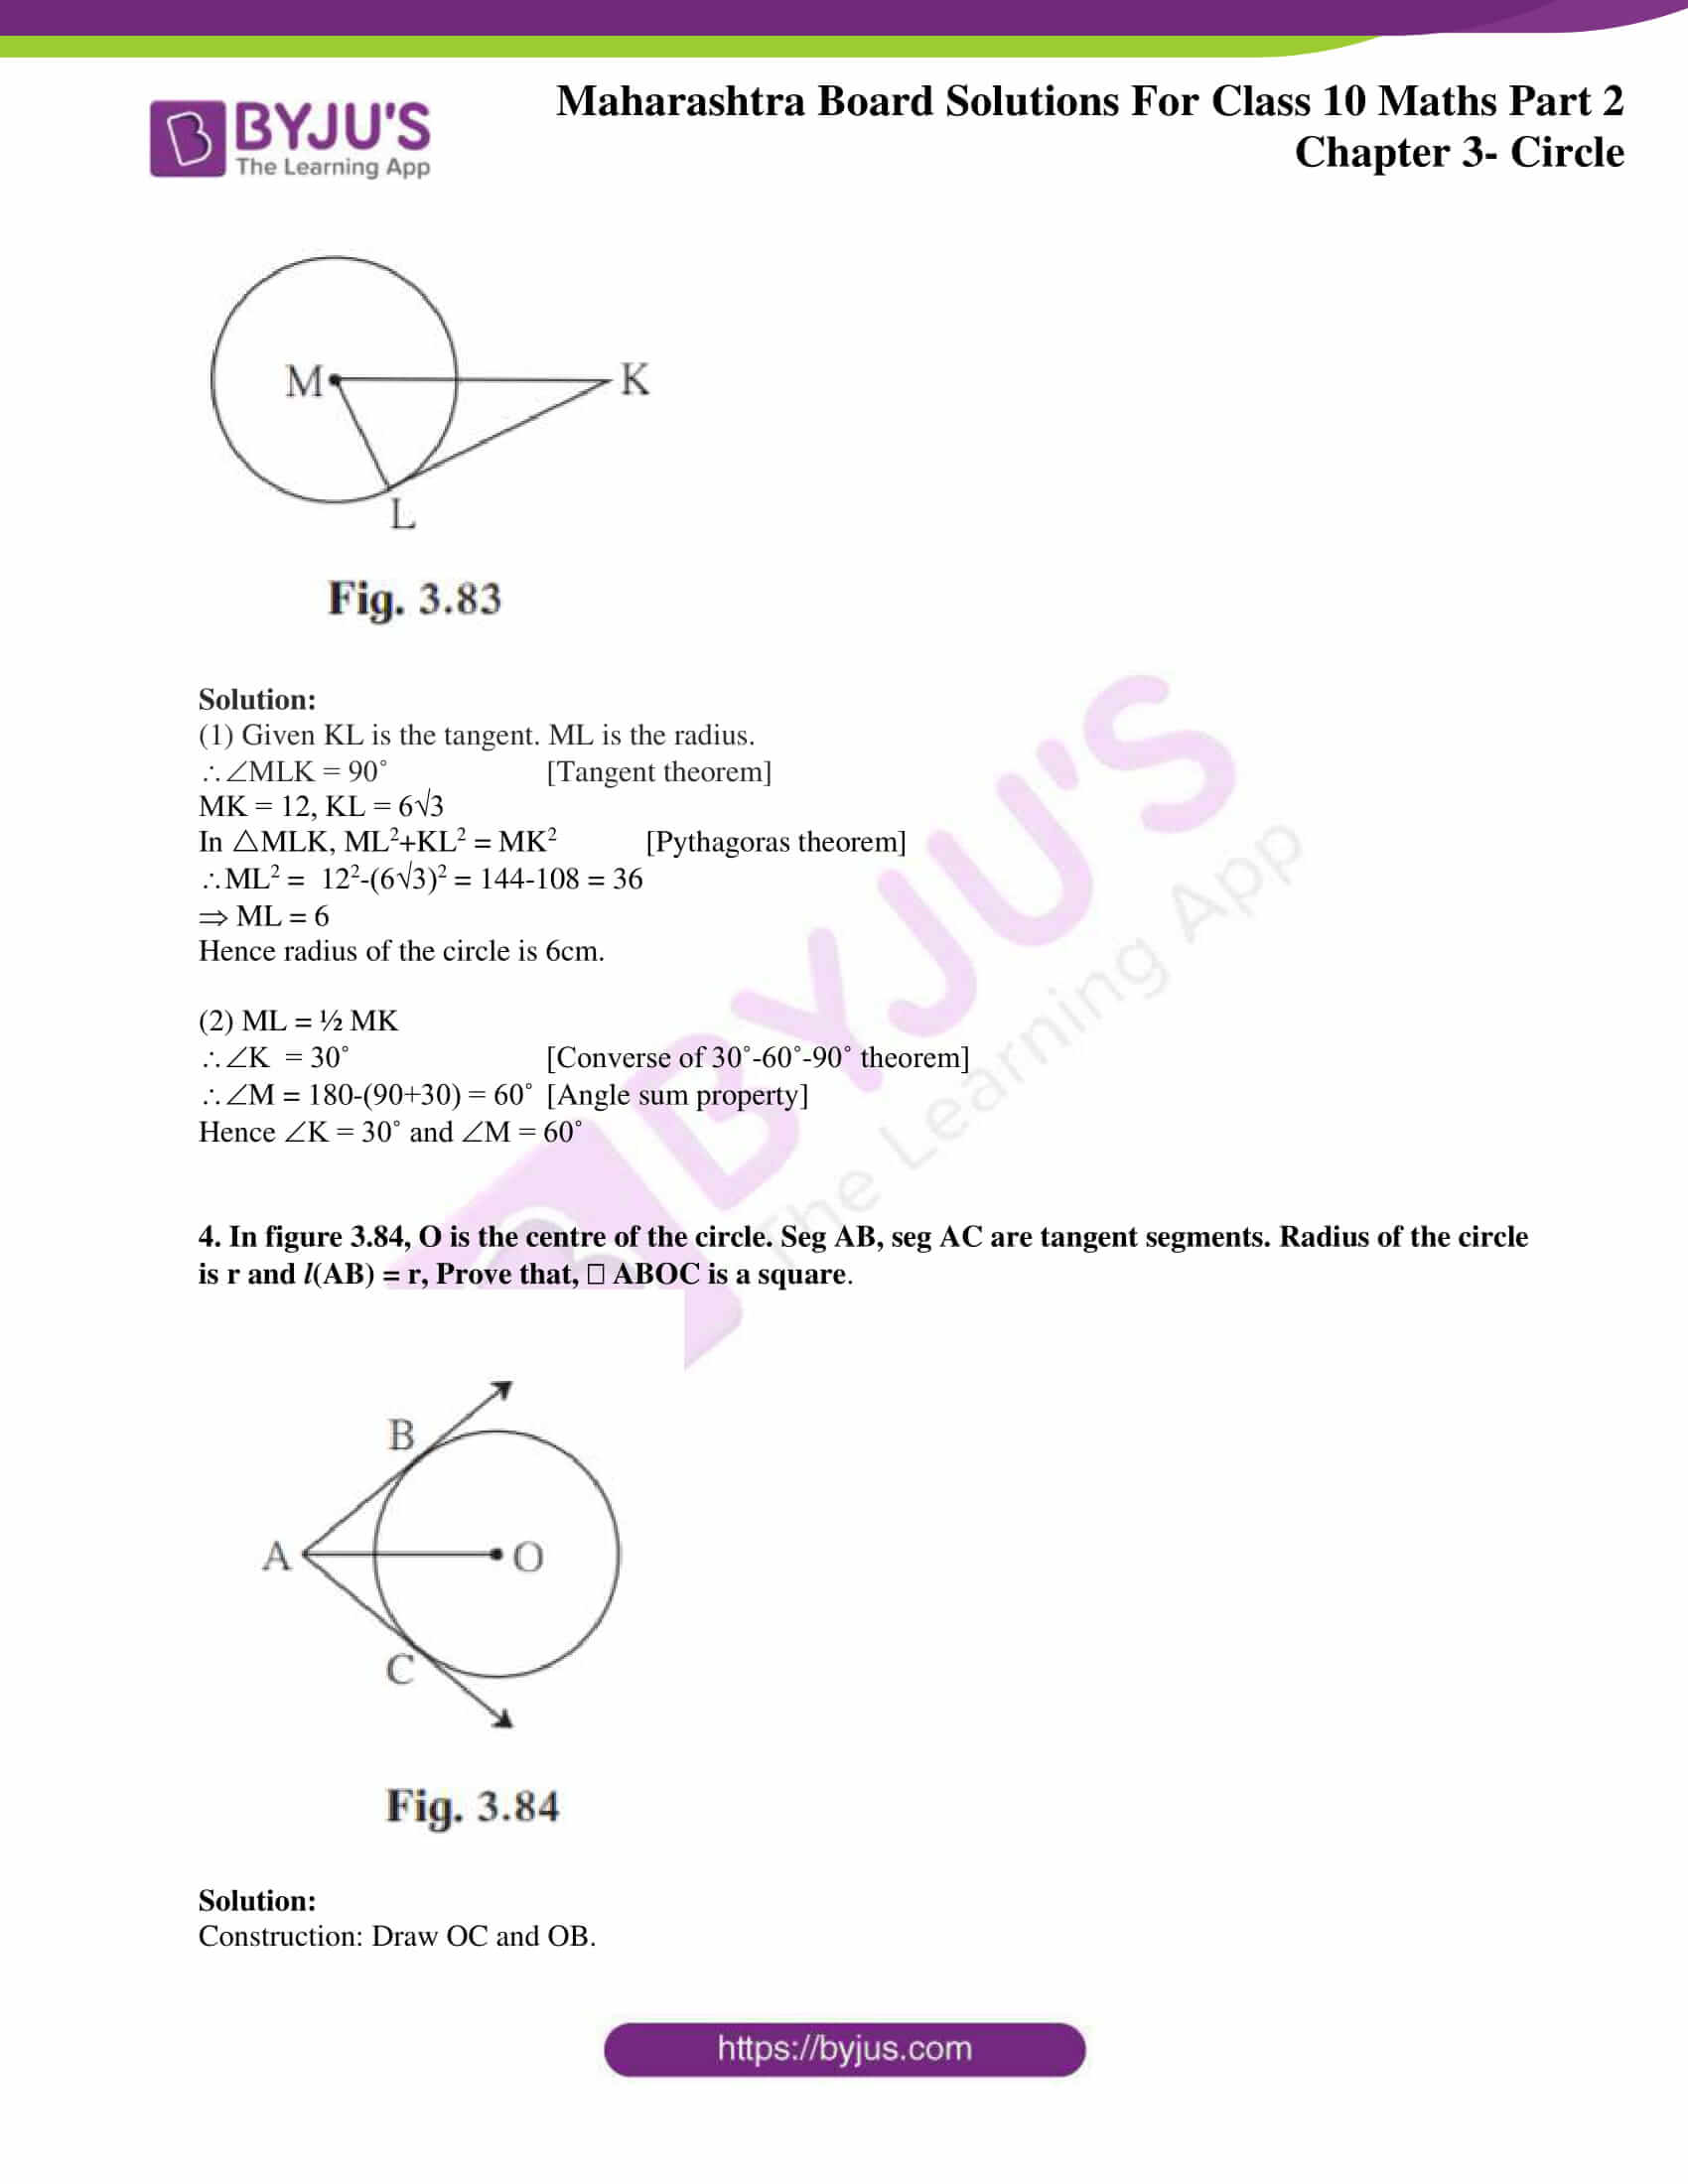 msbshse sol class 10 maths part 2 chapter 3 21